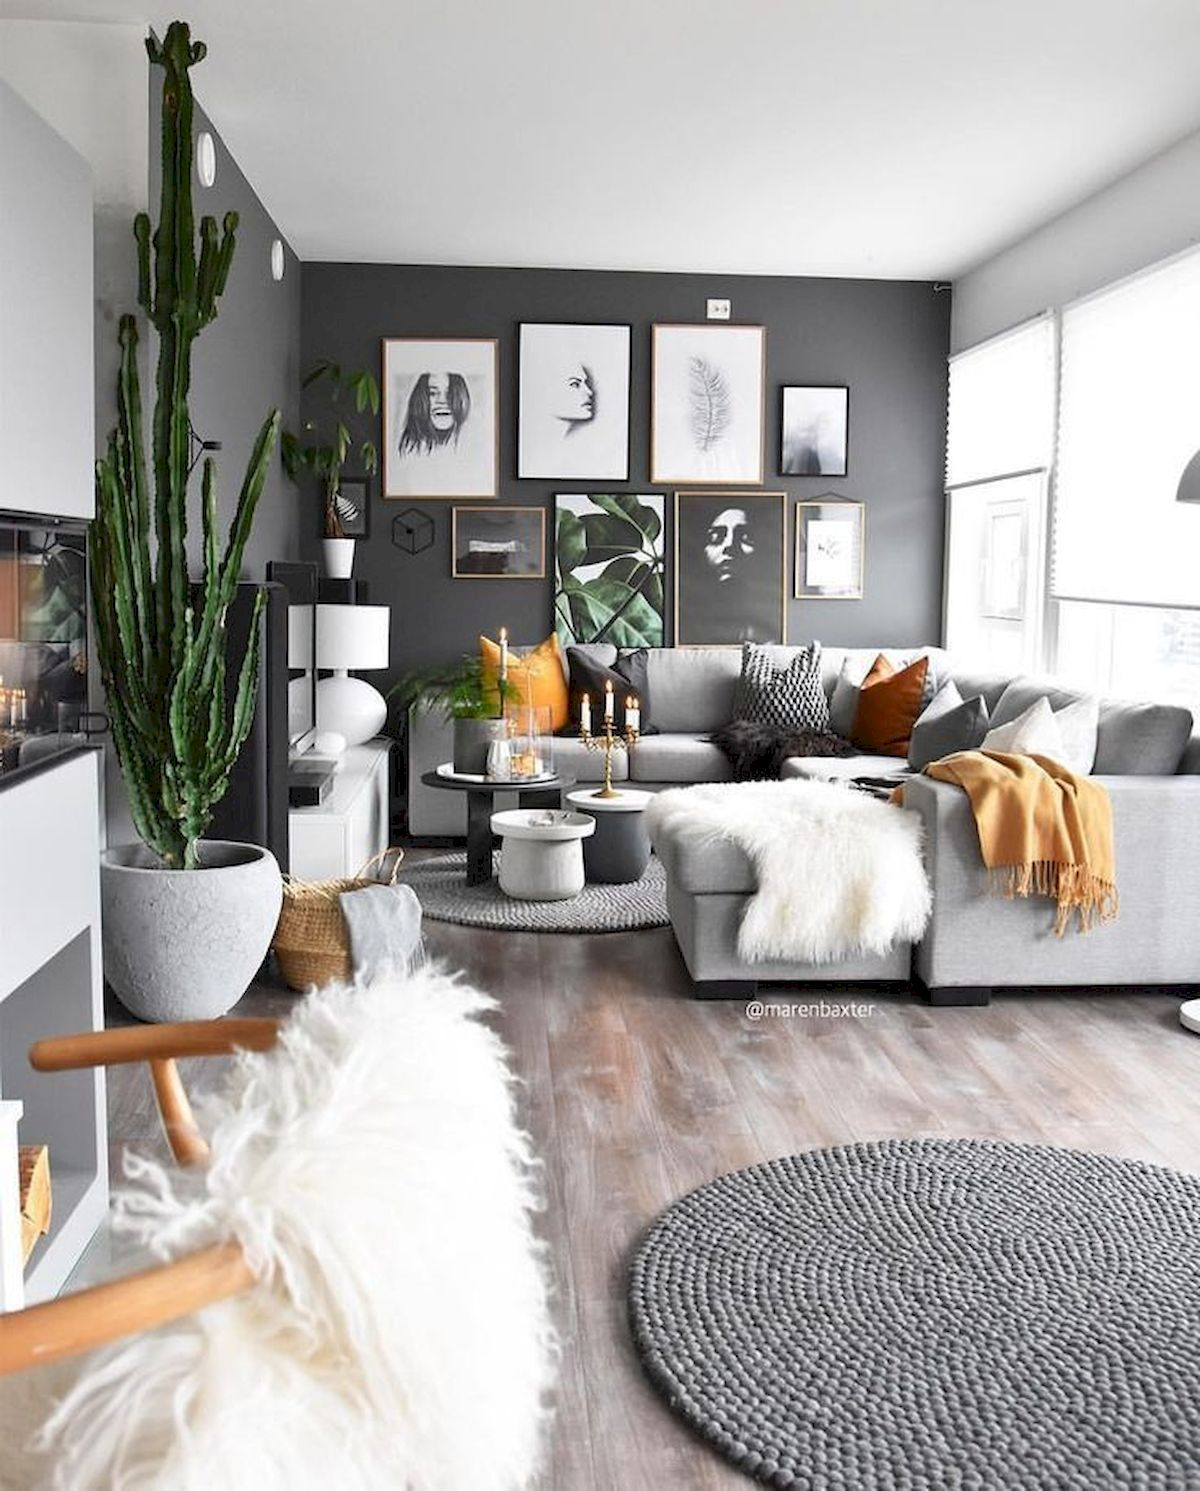 Unique Living Room Decor: 50 Beautiful Summer Apartment Decor Ideas And Makeover